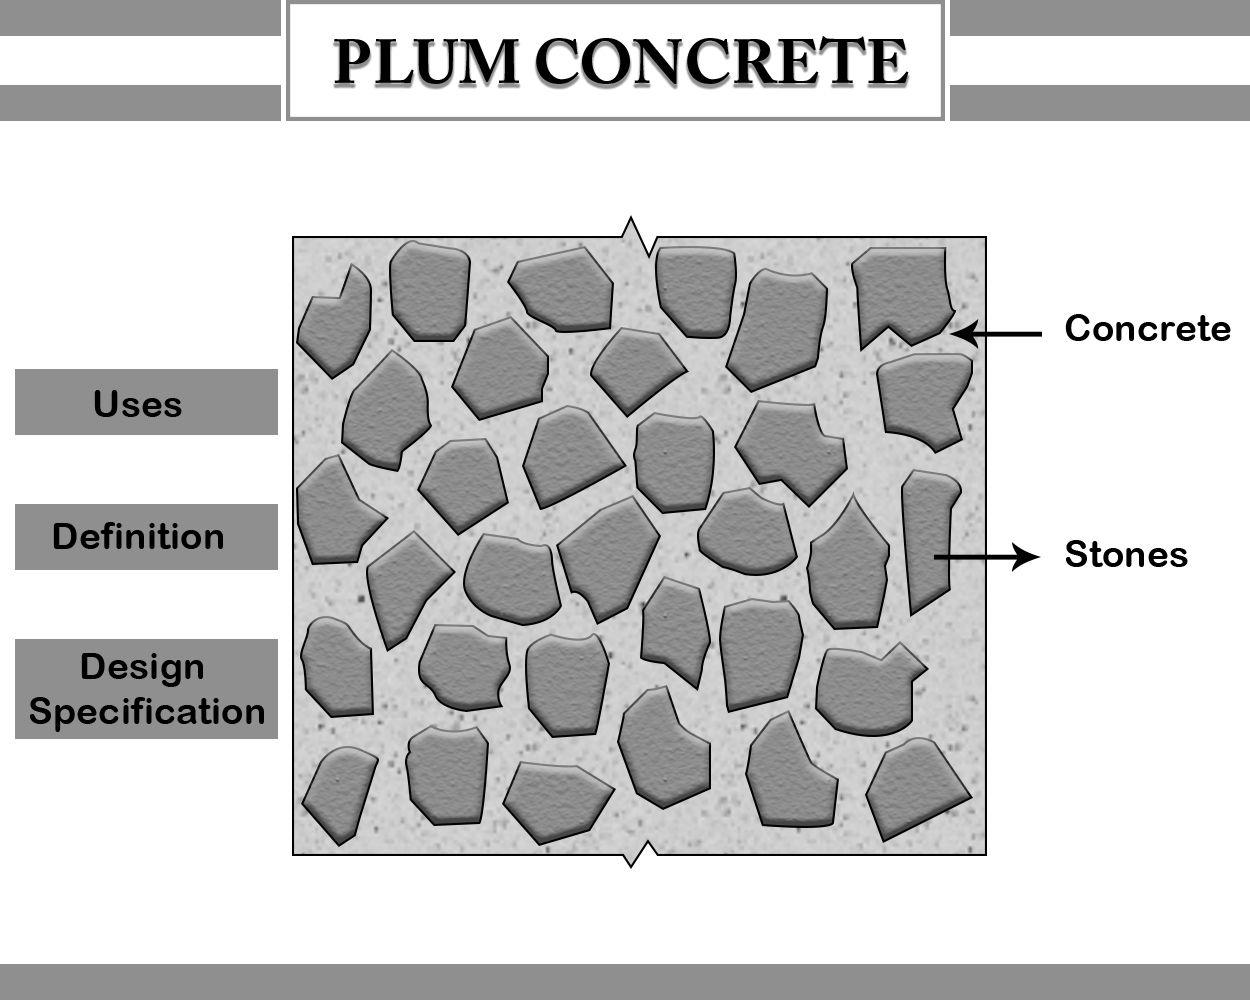 Plum Concrete What In 2020 Concrete Curing Concrete Types Of Concrete